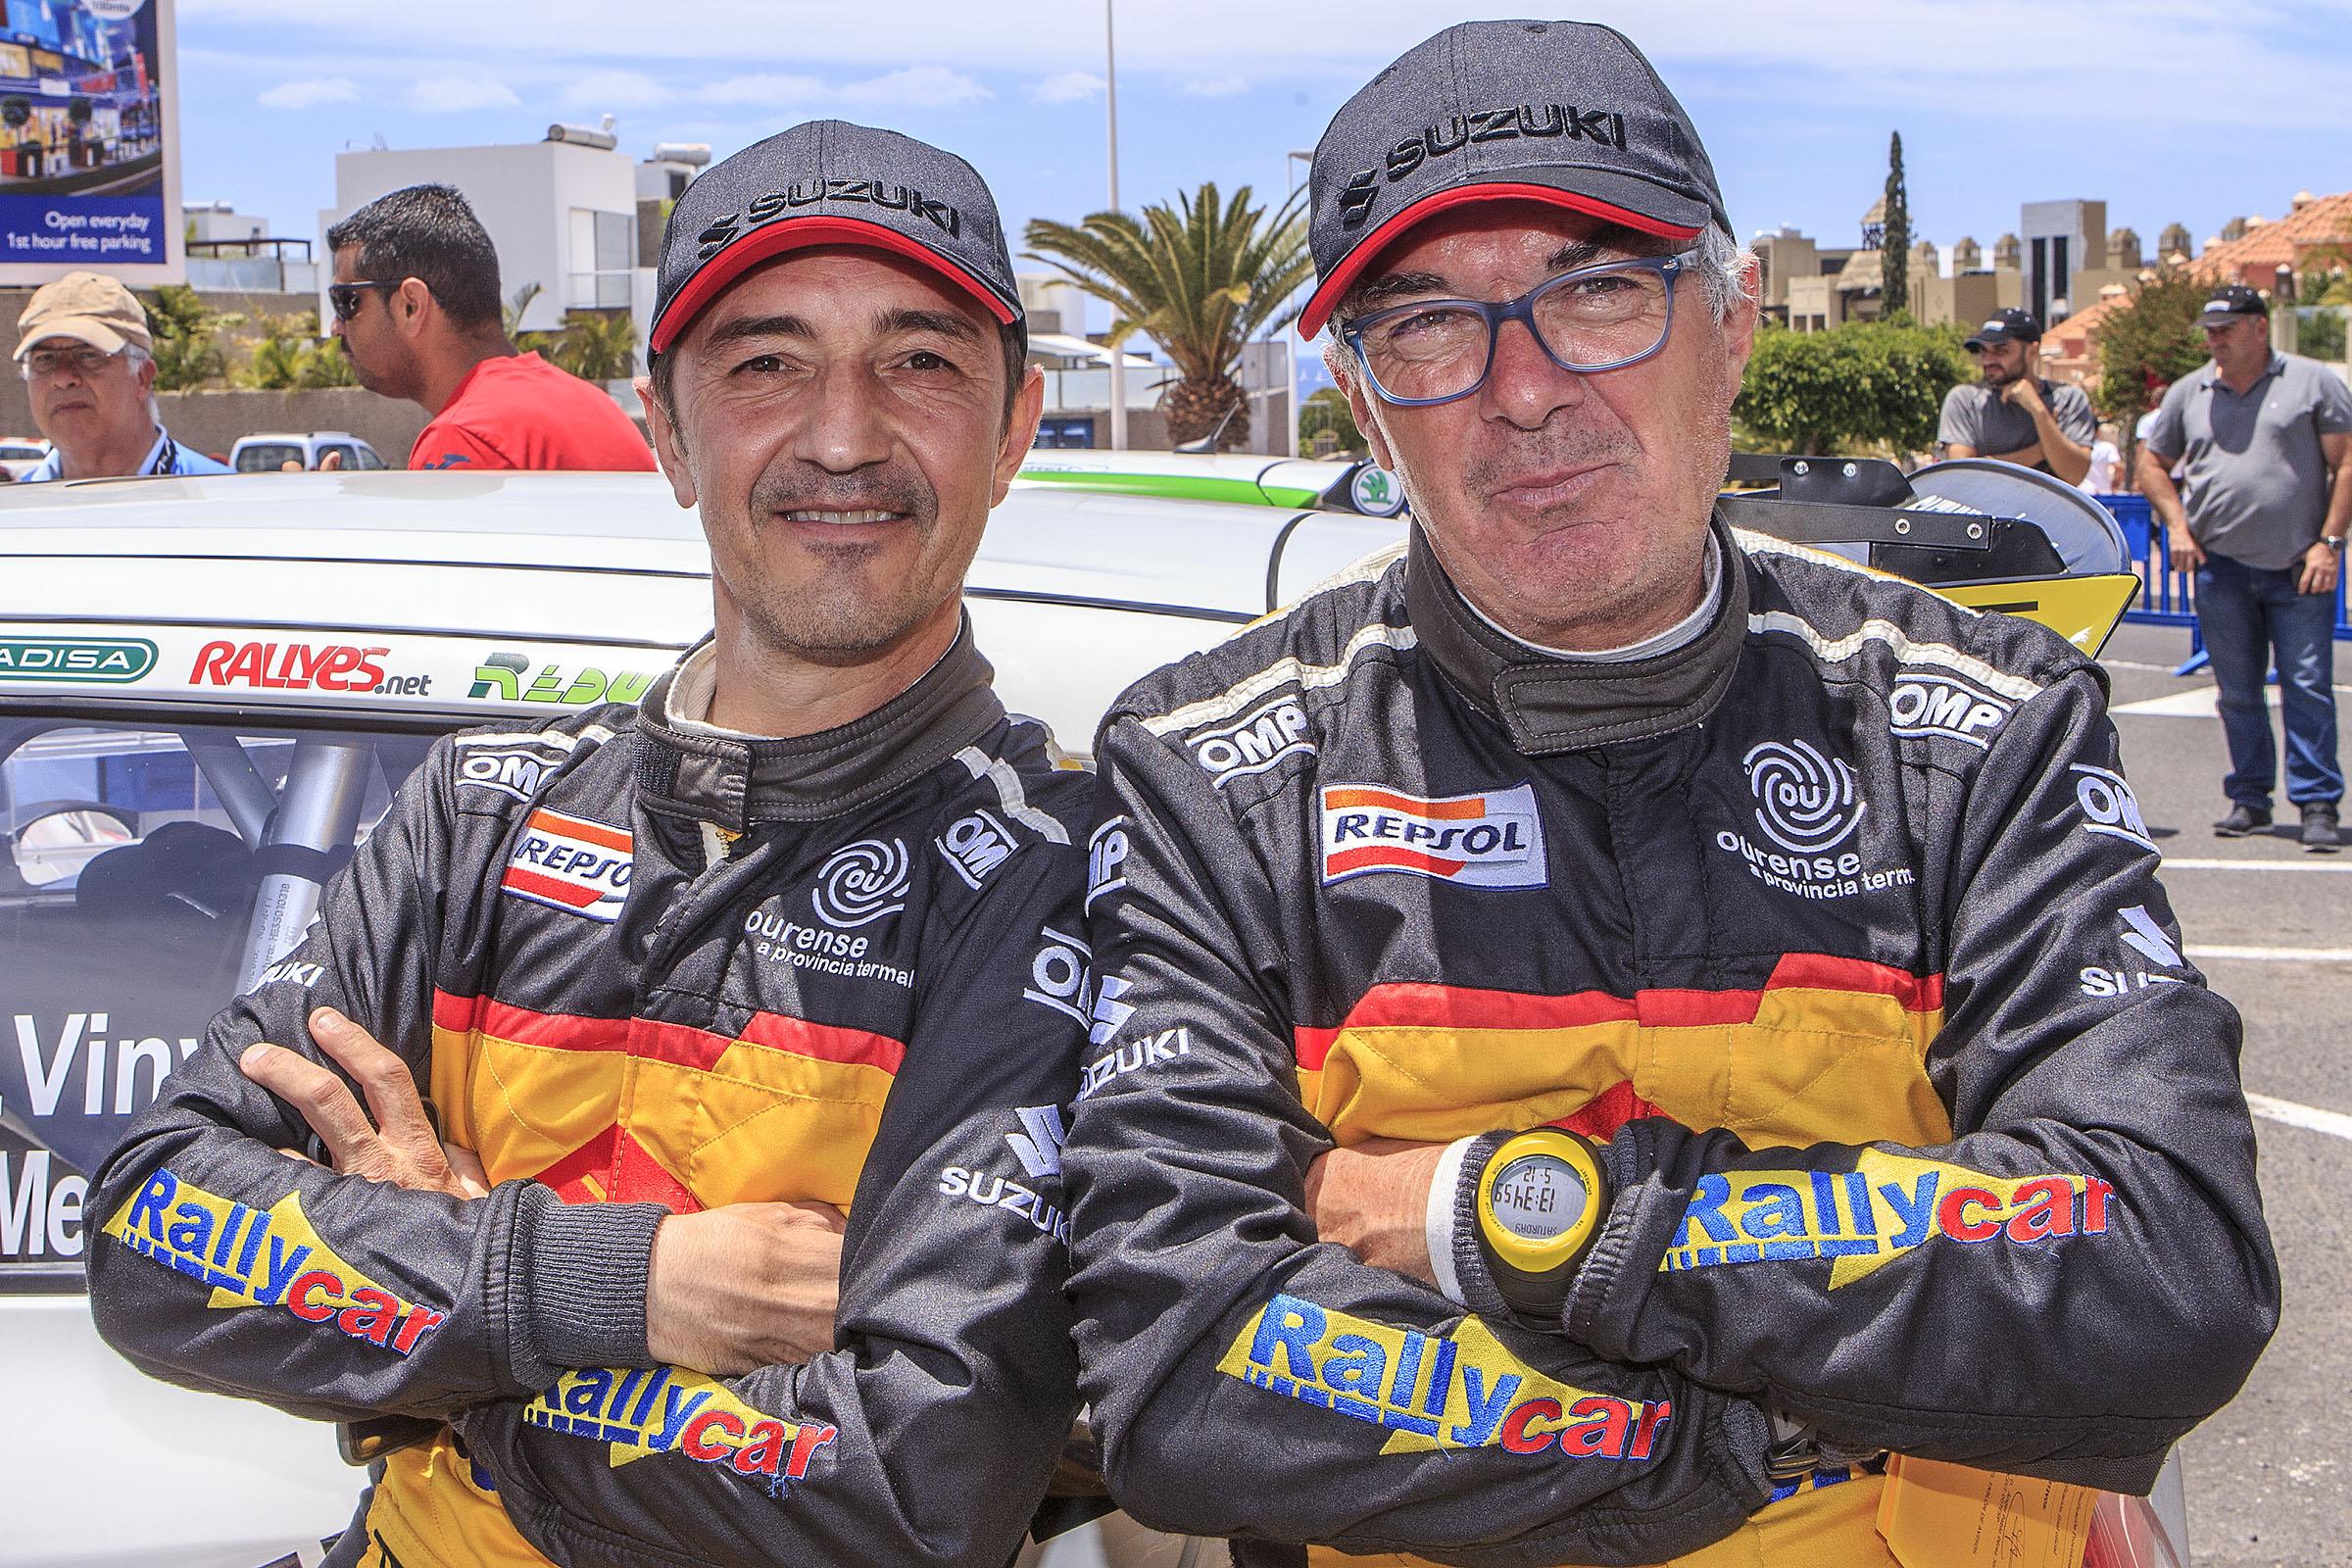 Joan Vinyes-Jordi Mercader (Suzuki Swift R+) s'enfrontaran a un Ral·li Orense reduït